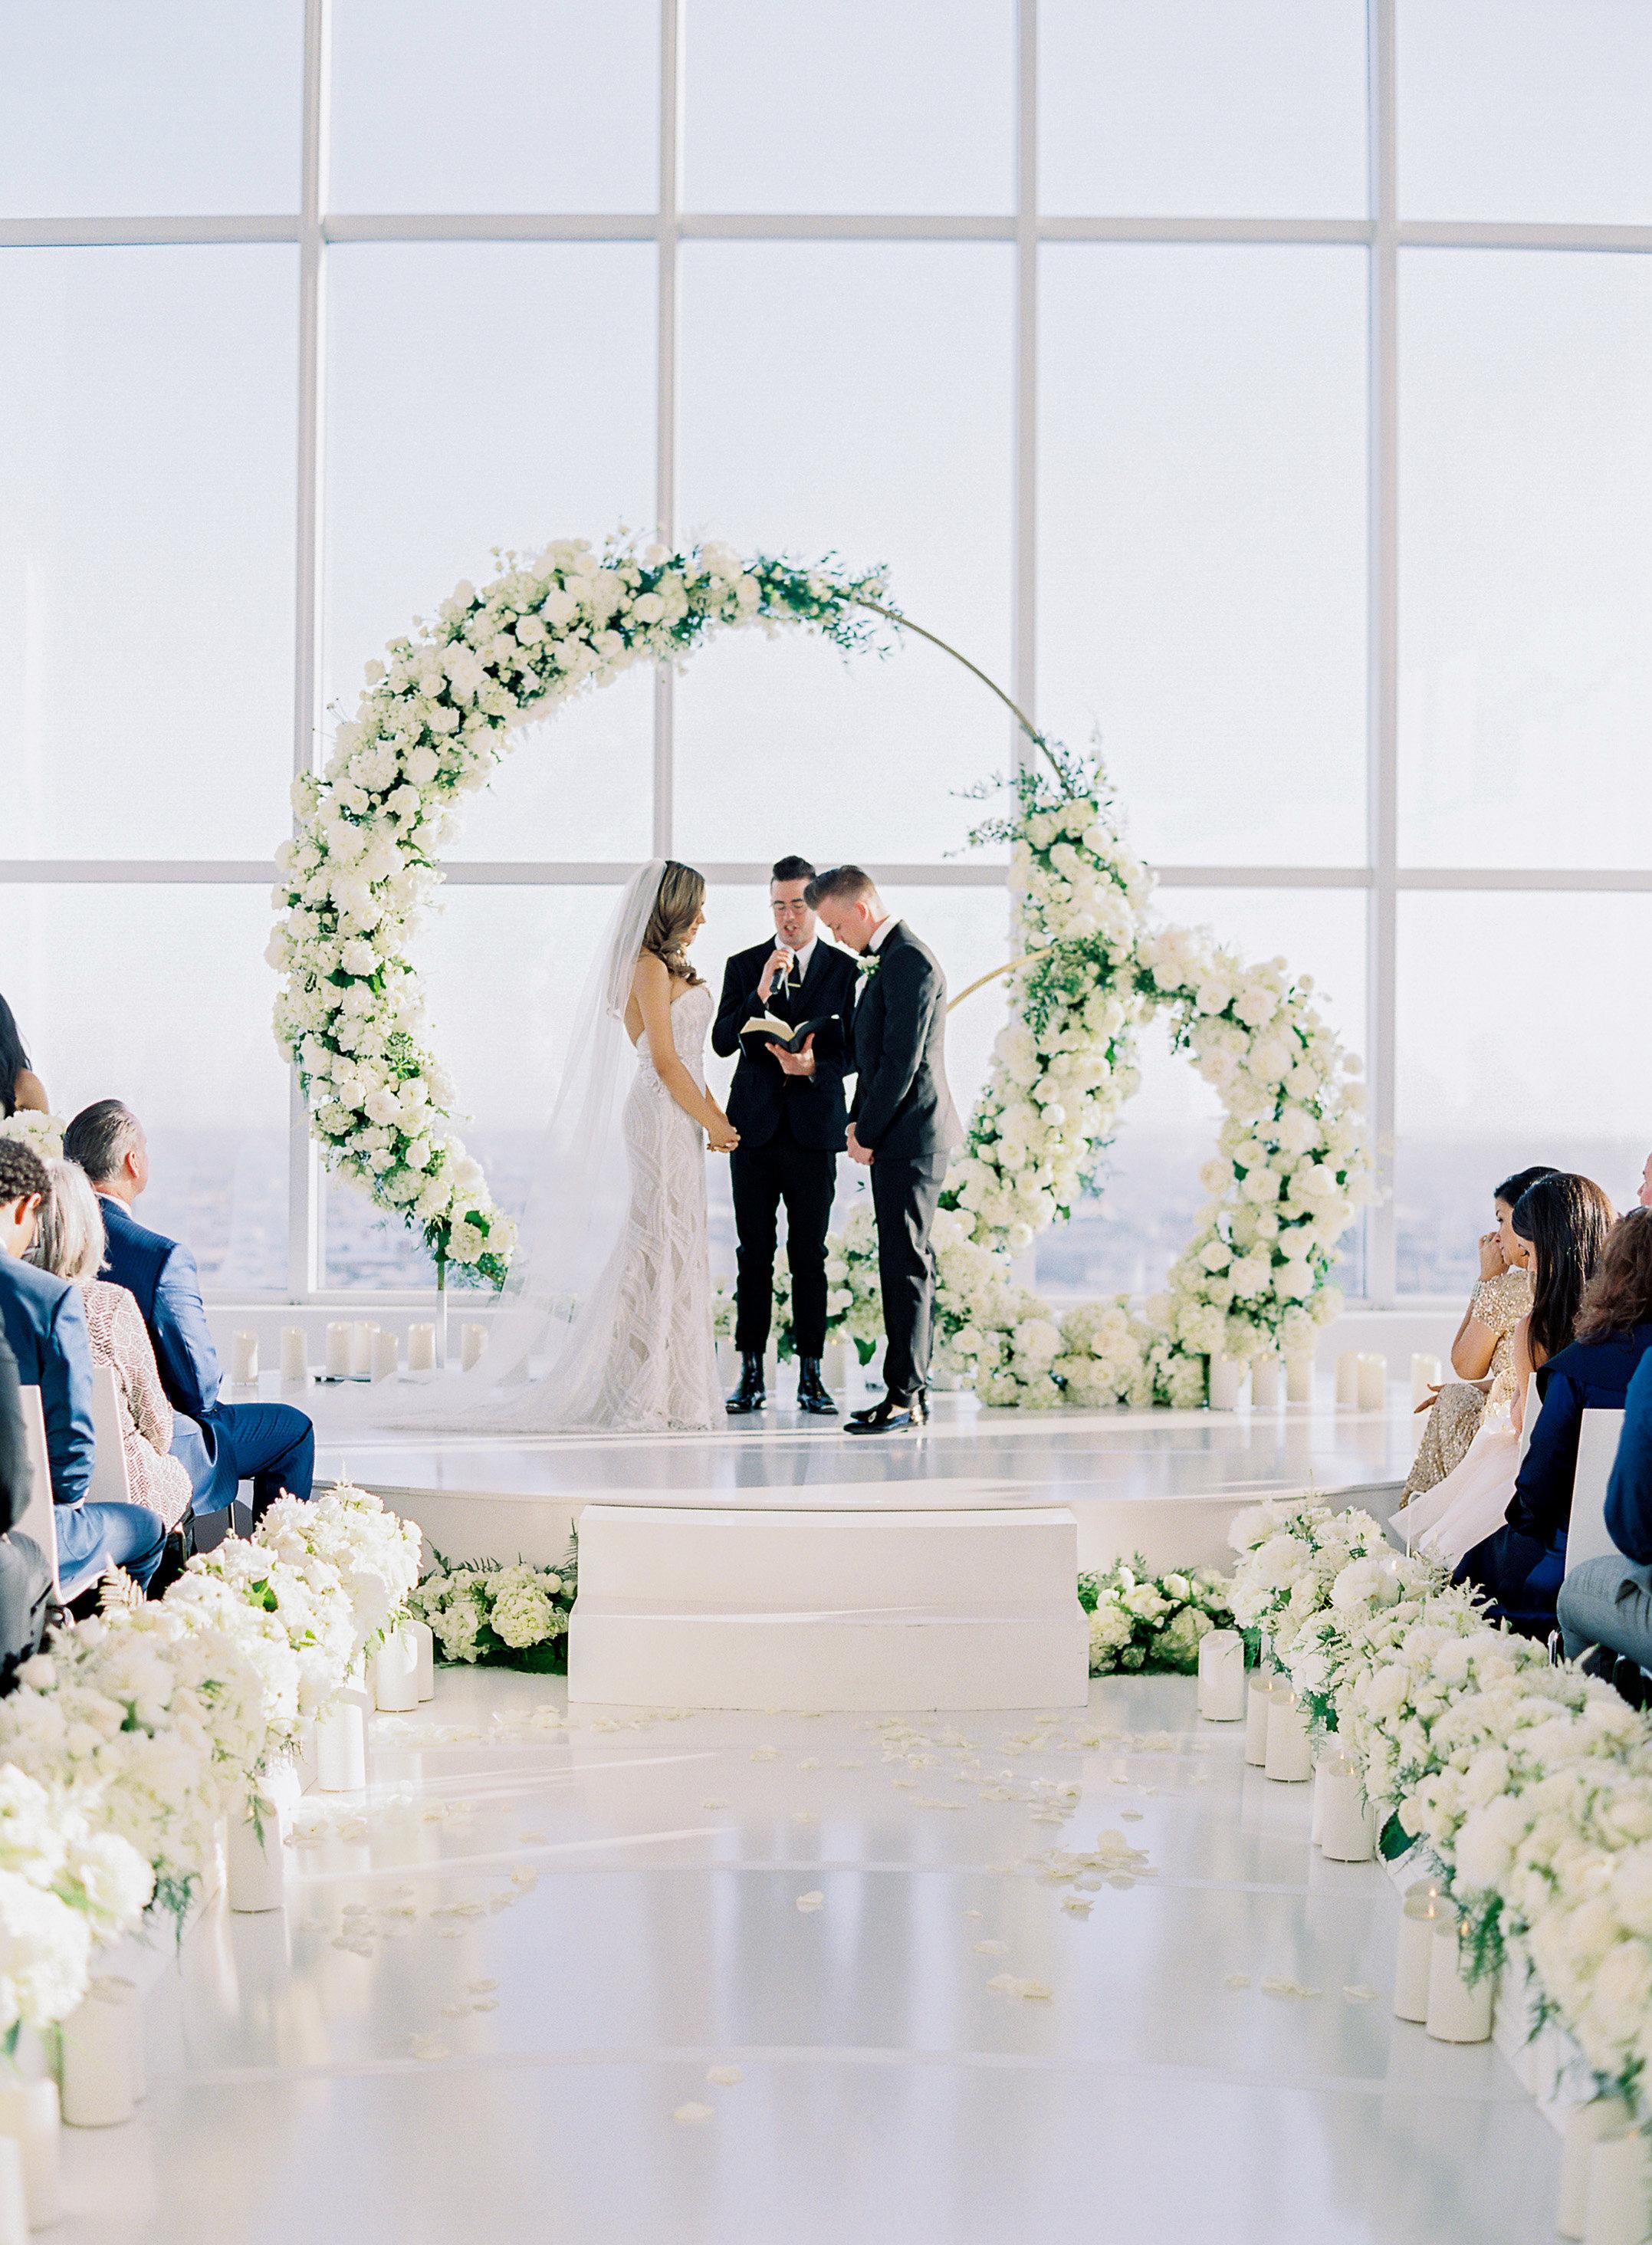 wedding backdrop ideas we